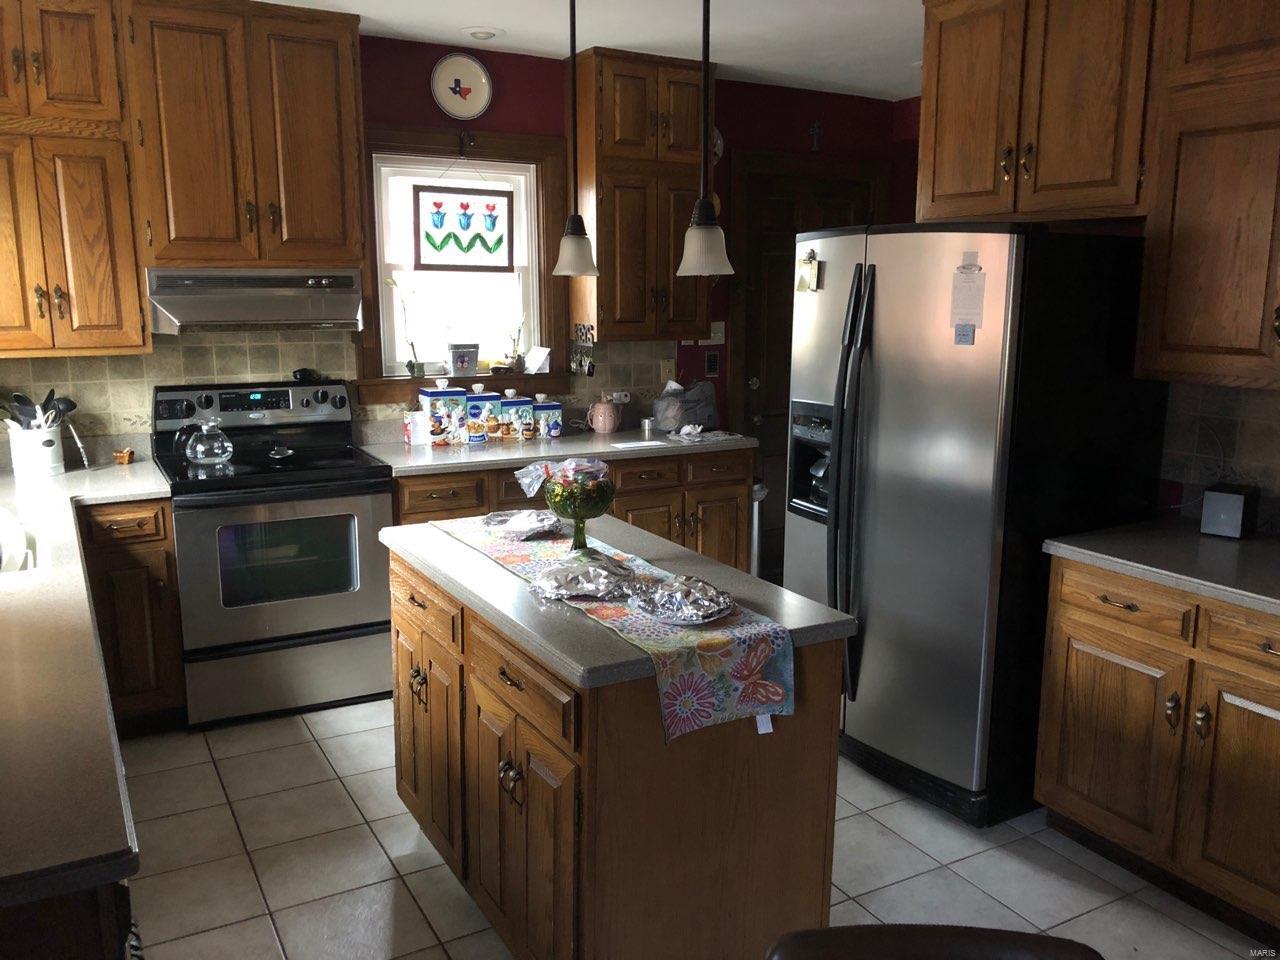 705 W GALLATIN Street Property Photo - Vandalia, IL real estate listing